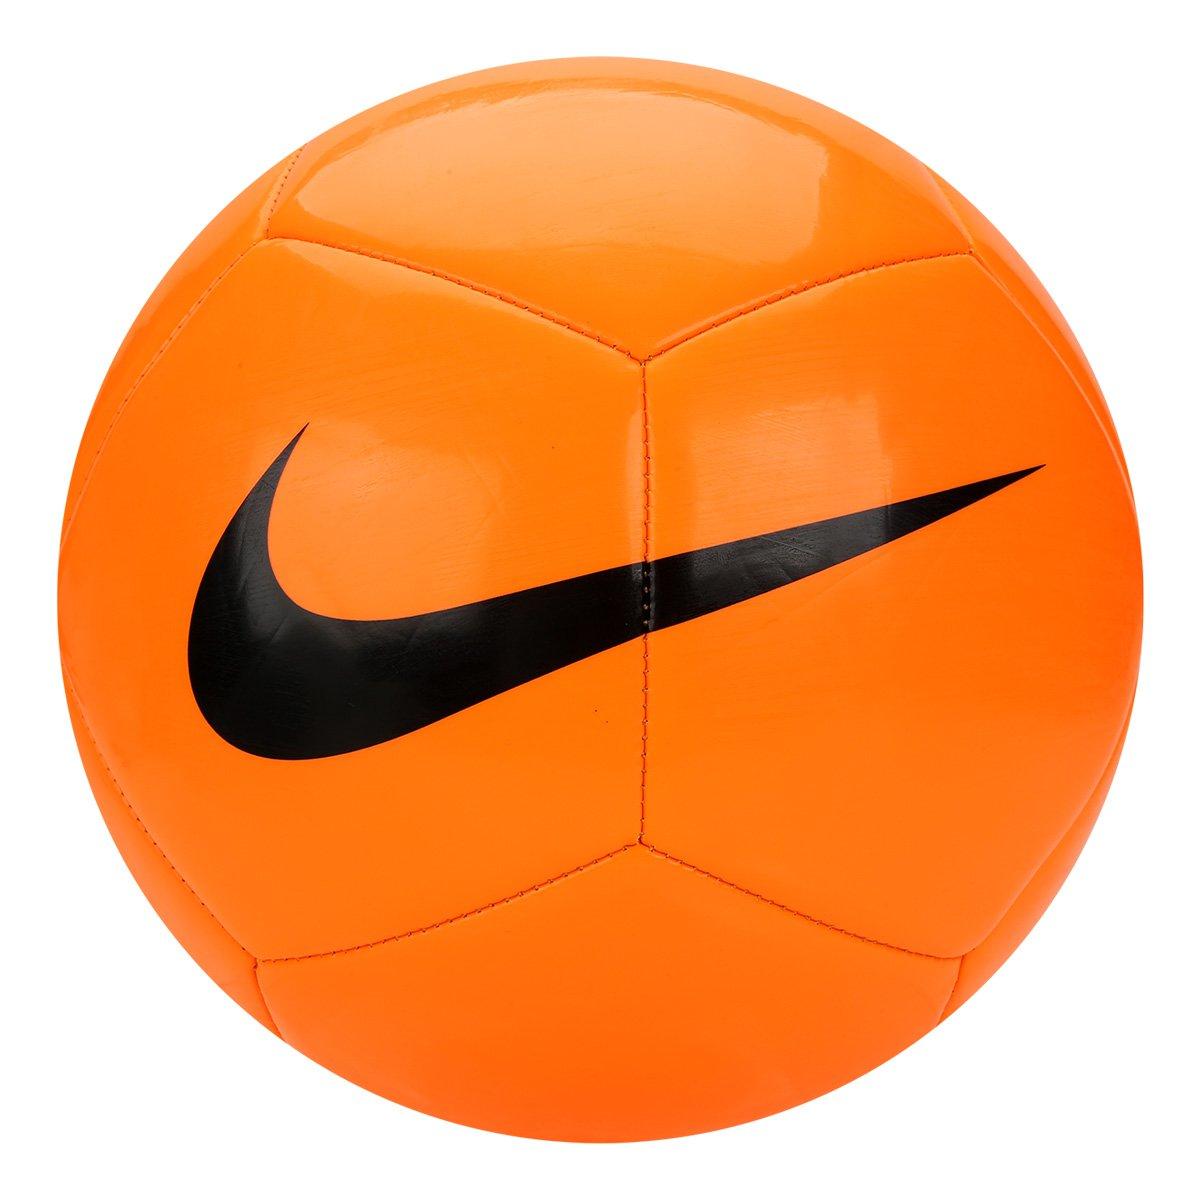 ed505c150e Bola Futebol Campo Nike Pich Team